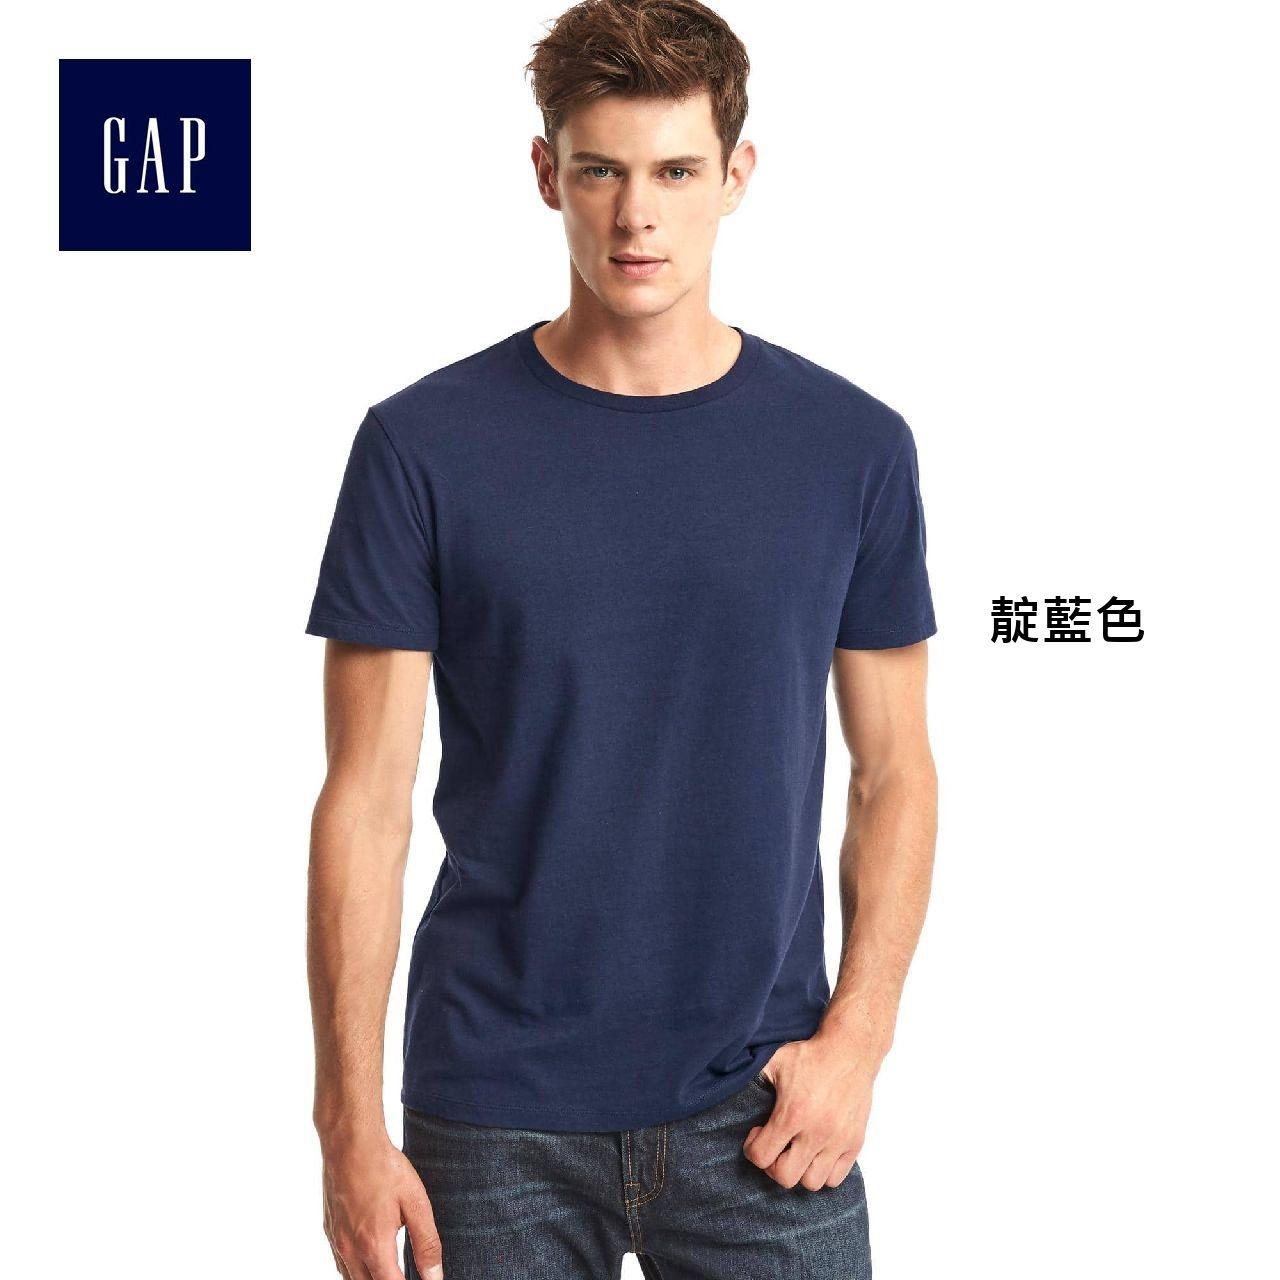 Gap男裝 基本款純色純棉T恤 768620